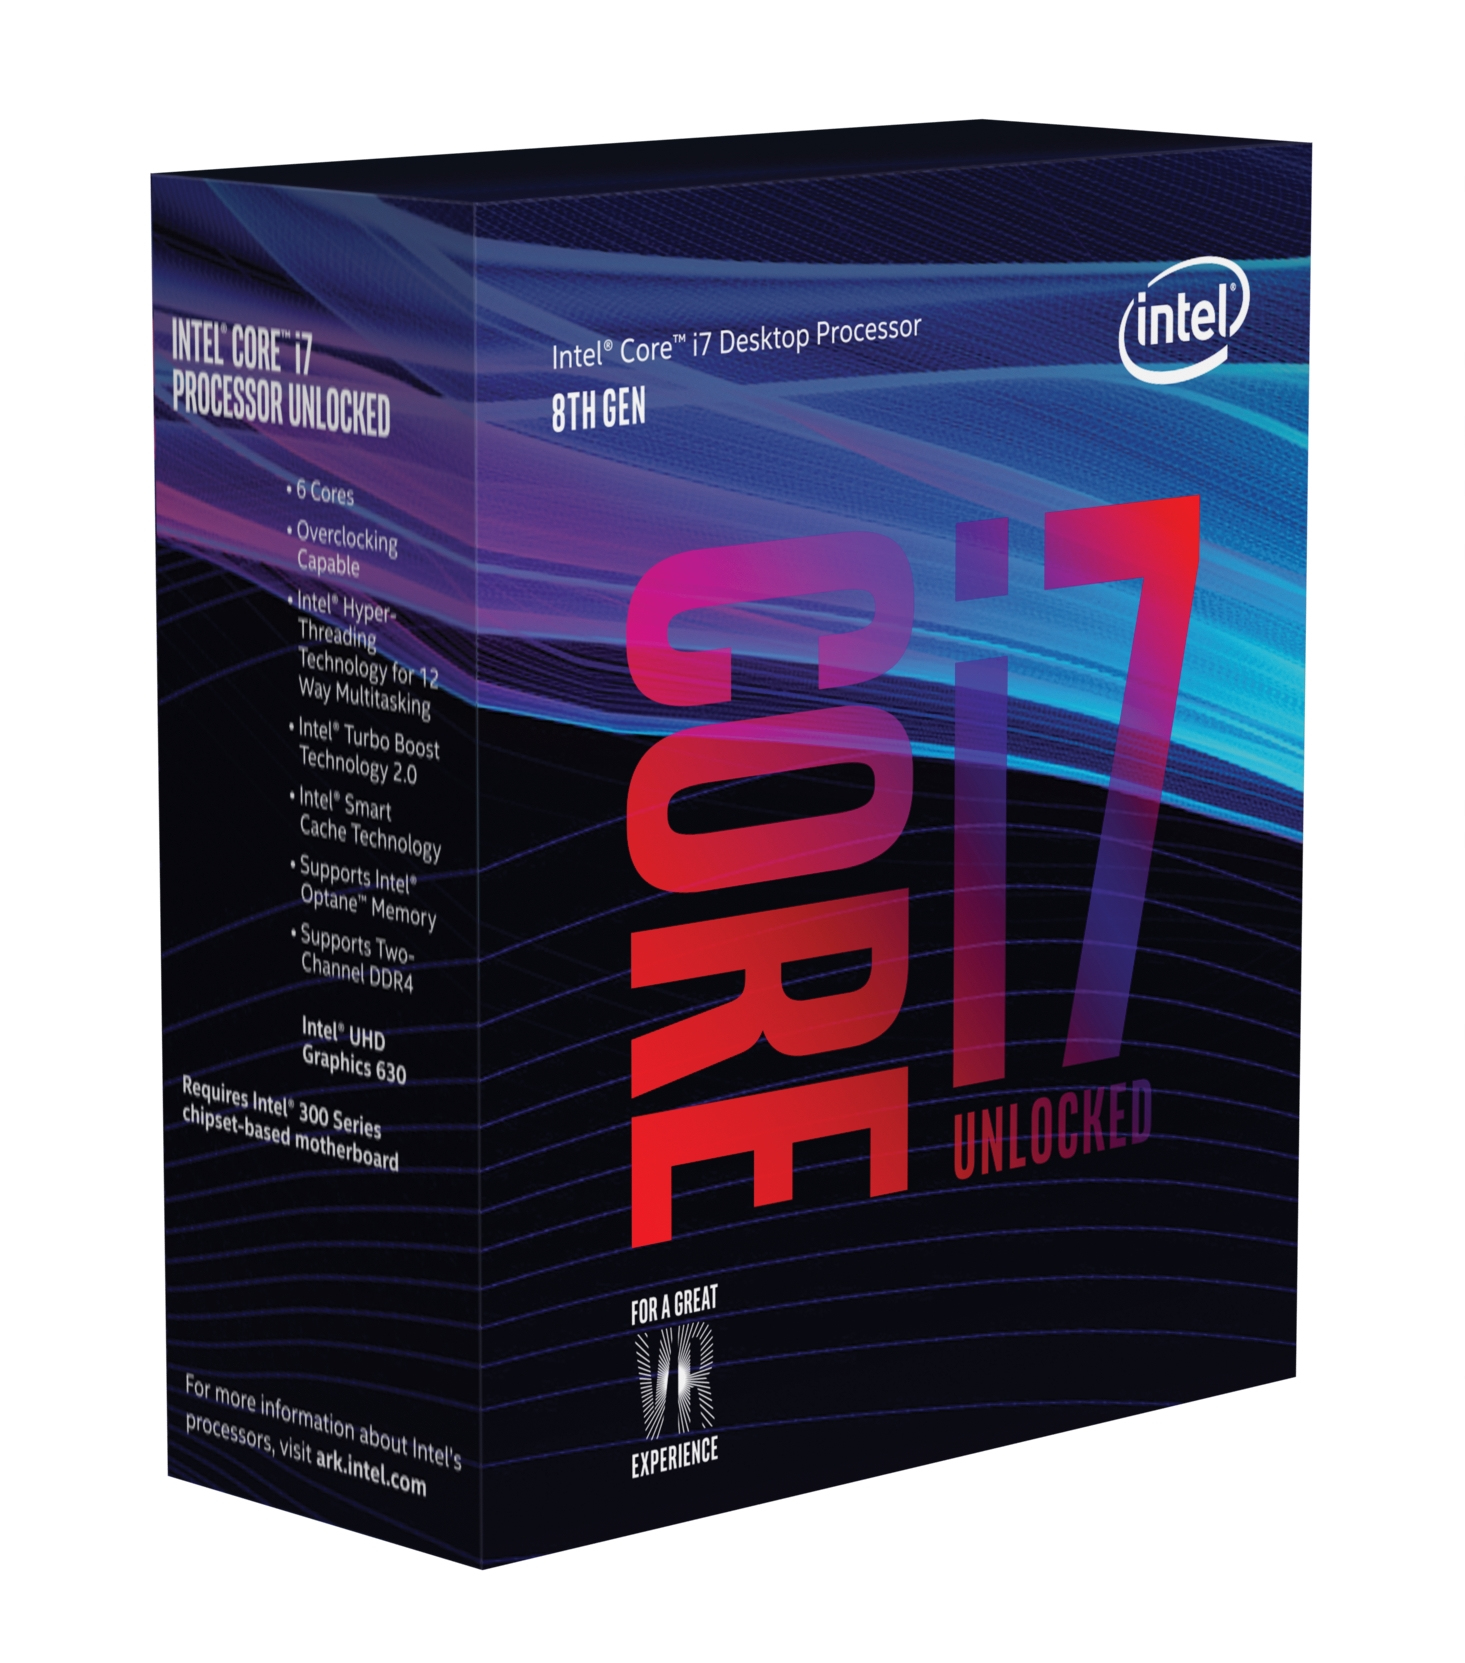 Intel Core ®  i7-8700K Processor (12M Cache - up to 4.70 GHz) 3.7GHz 12MB Smart Cache Box Prozessor